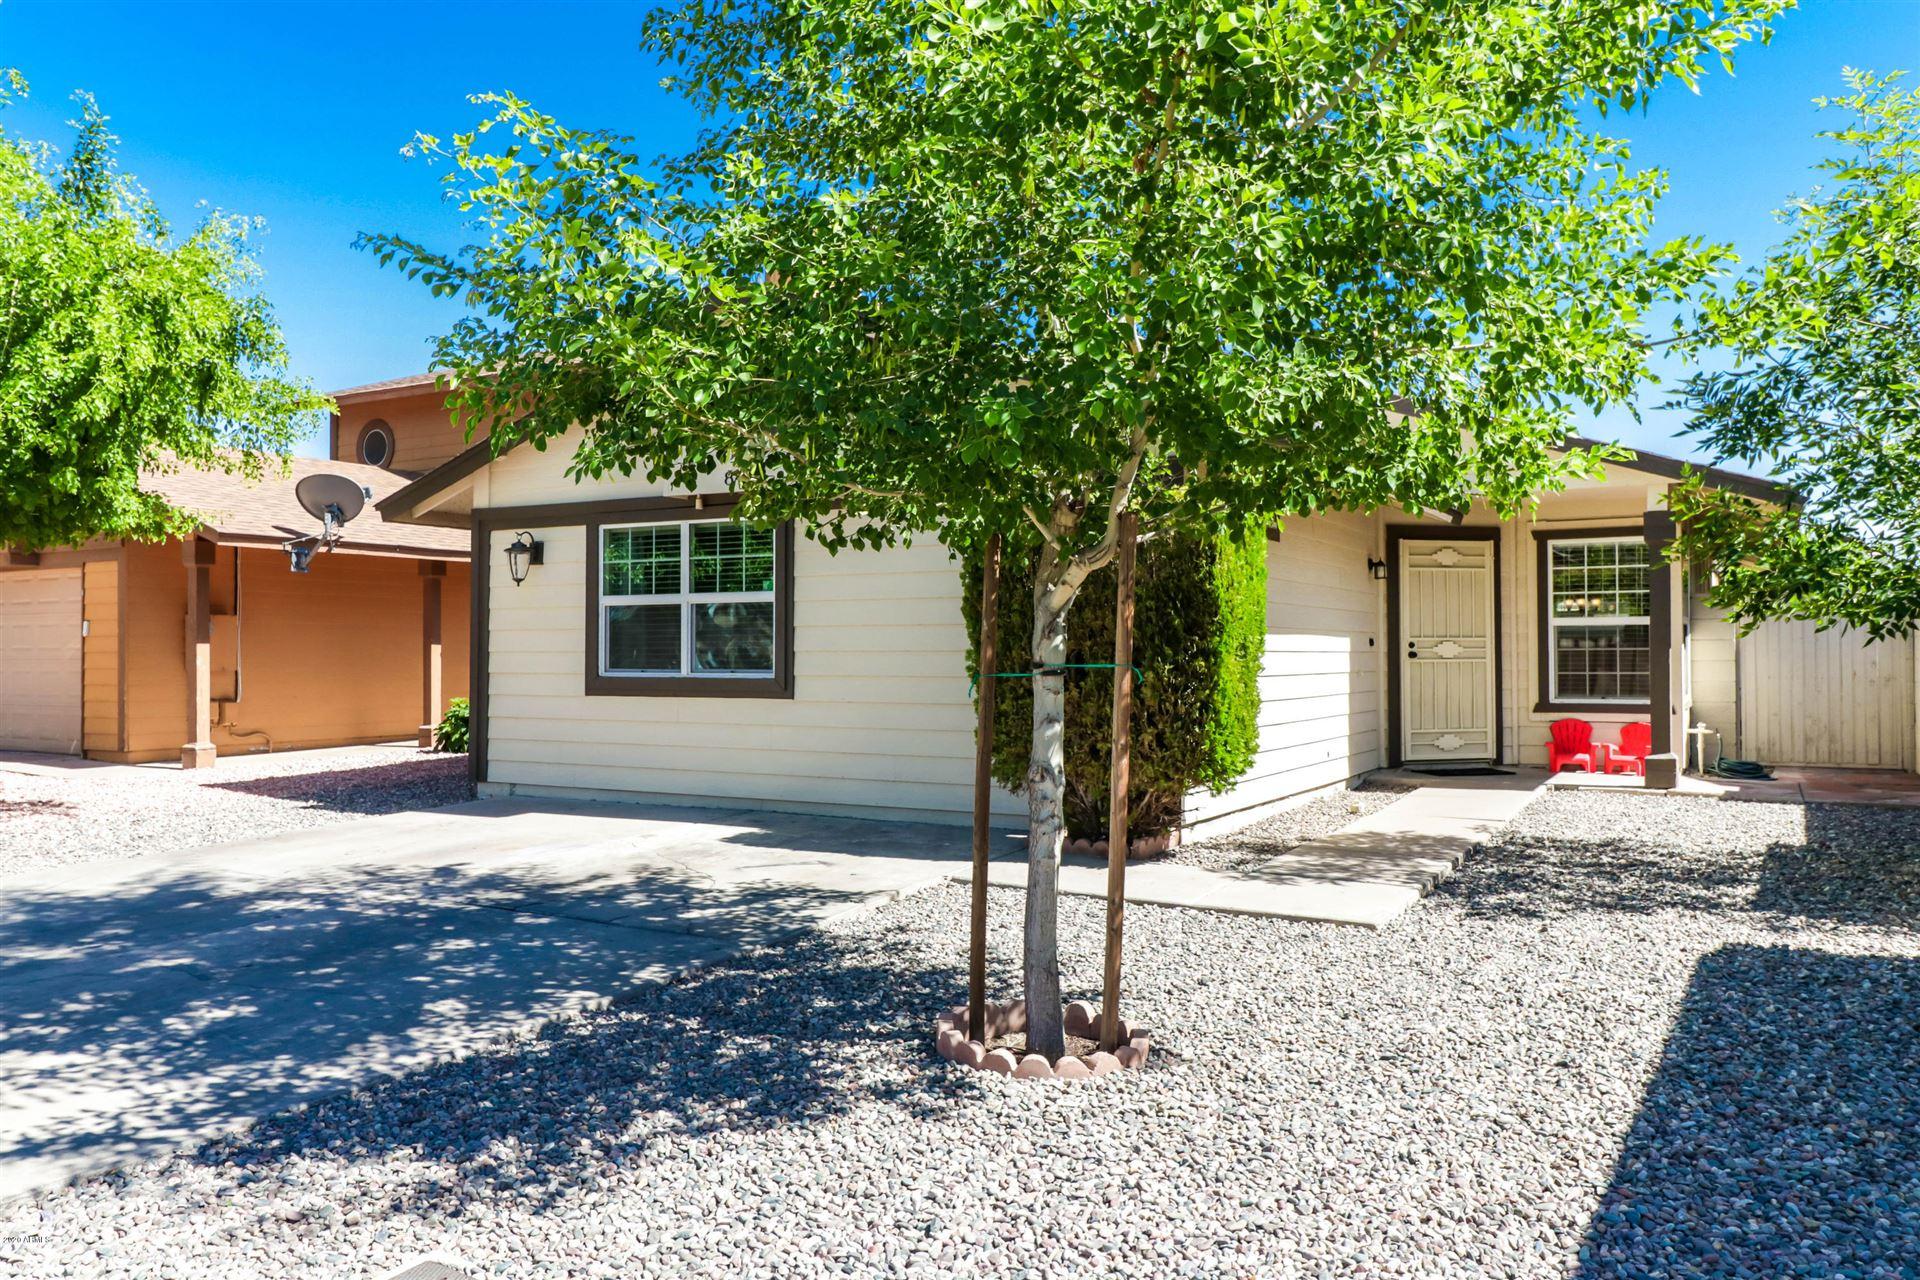 8433 W SELLS Drive, Phoenix, AZ 85037 - #: 6081148